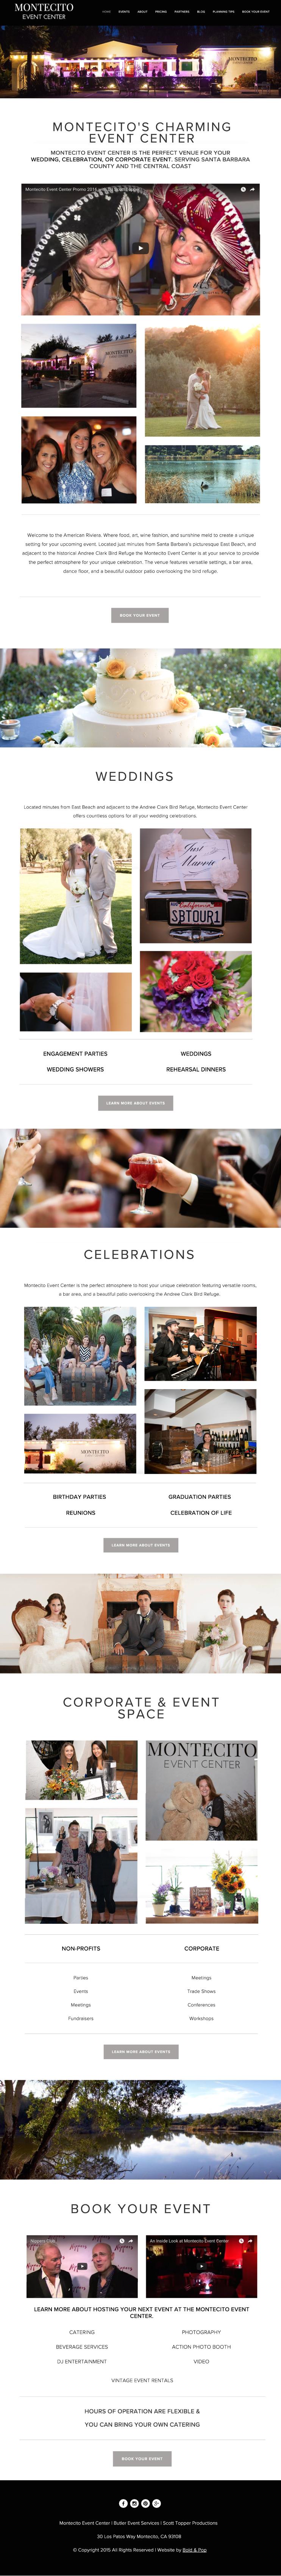 Event Venue Website Design